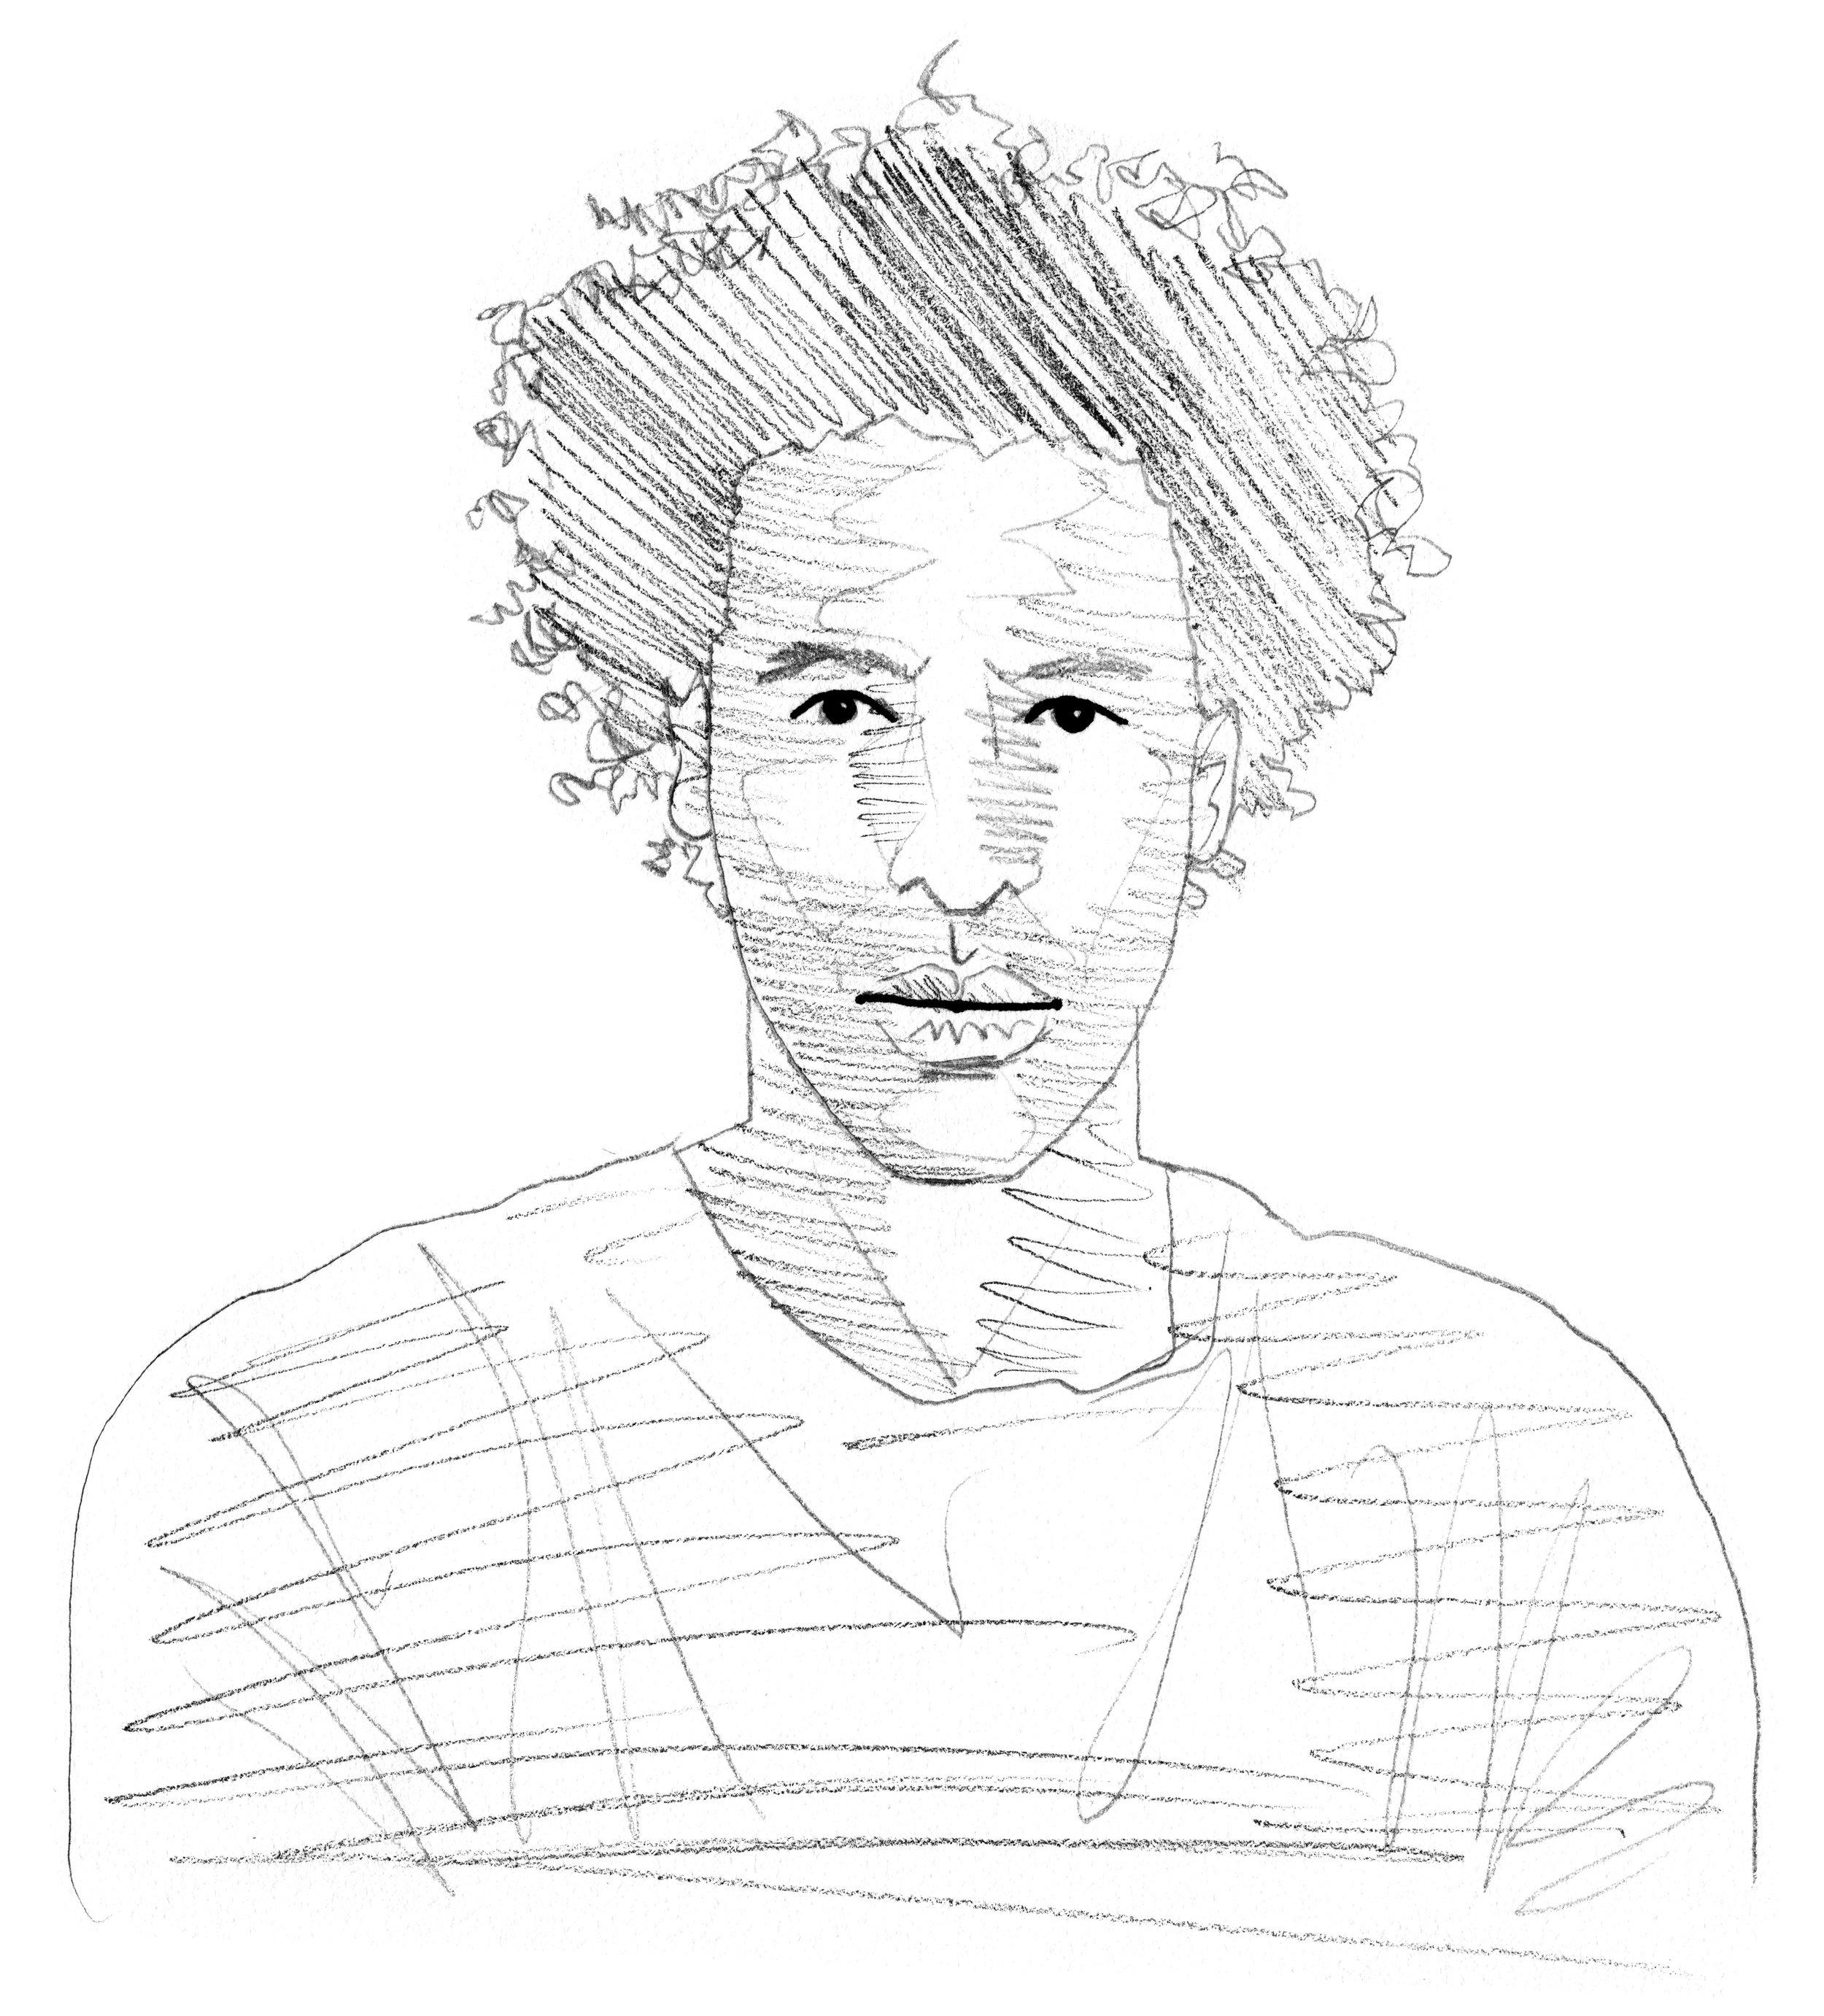 Drawing by Brian Elstak